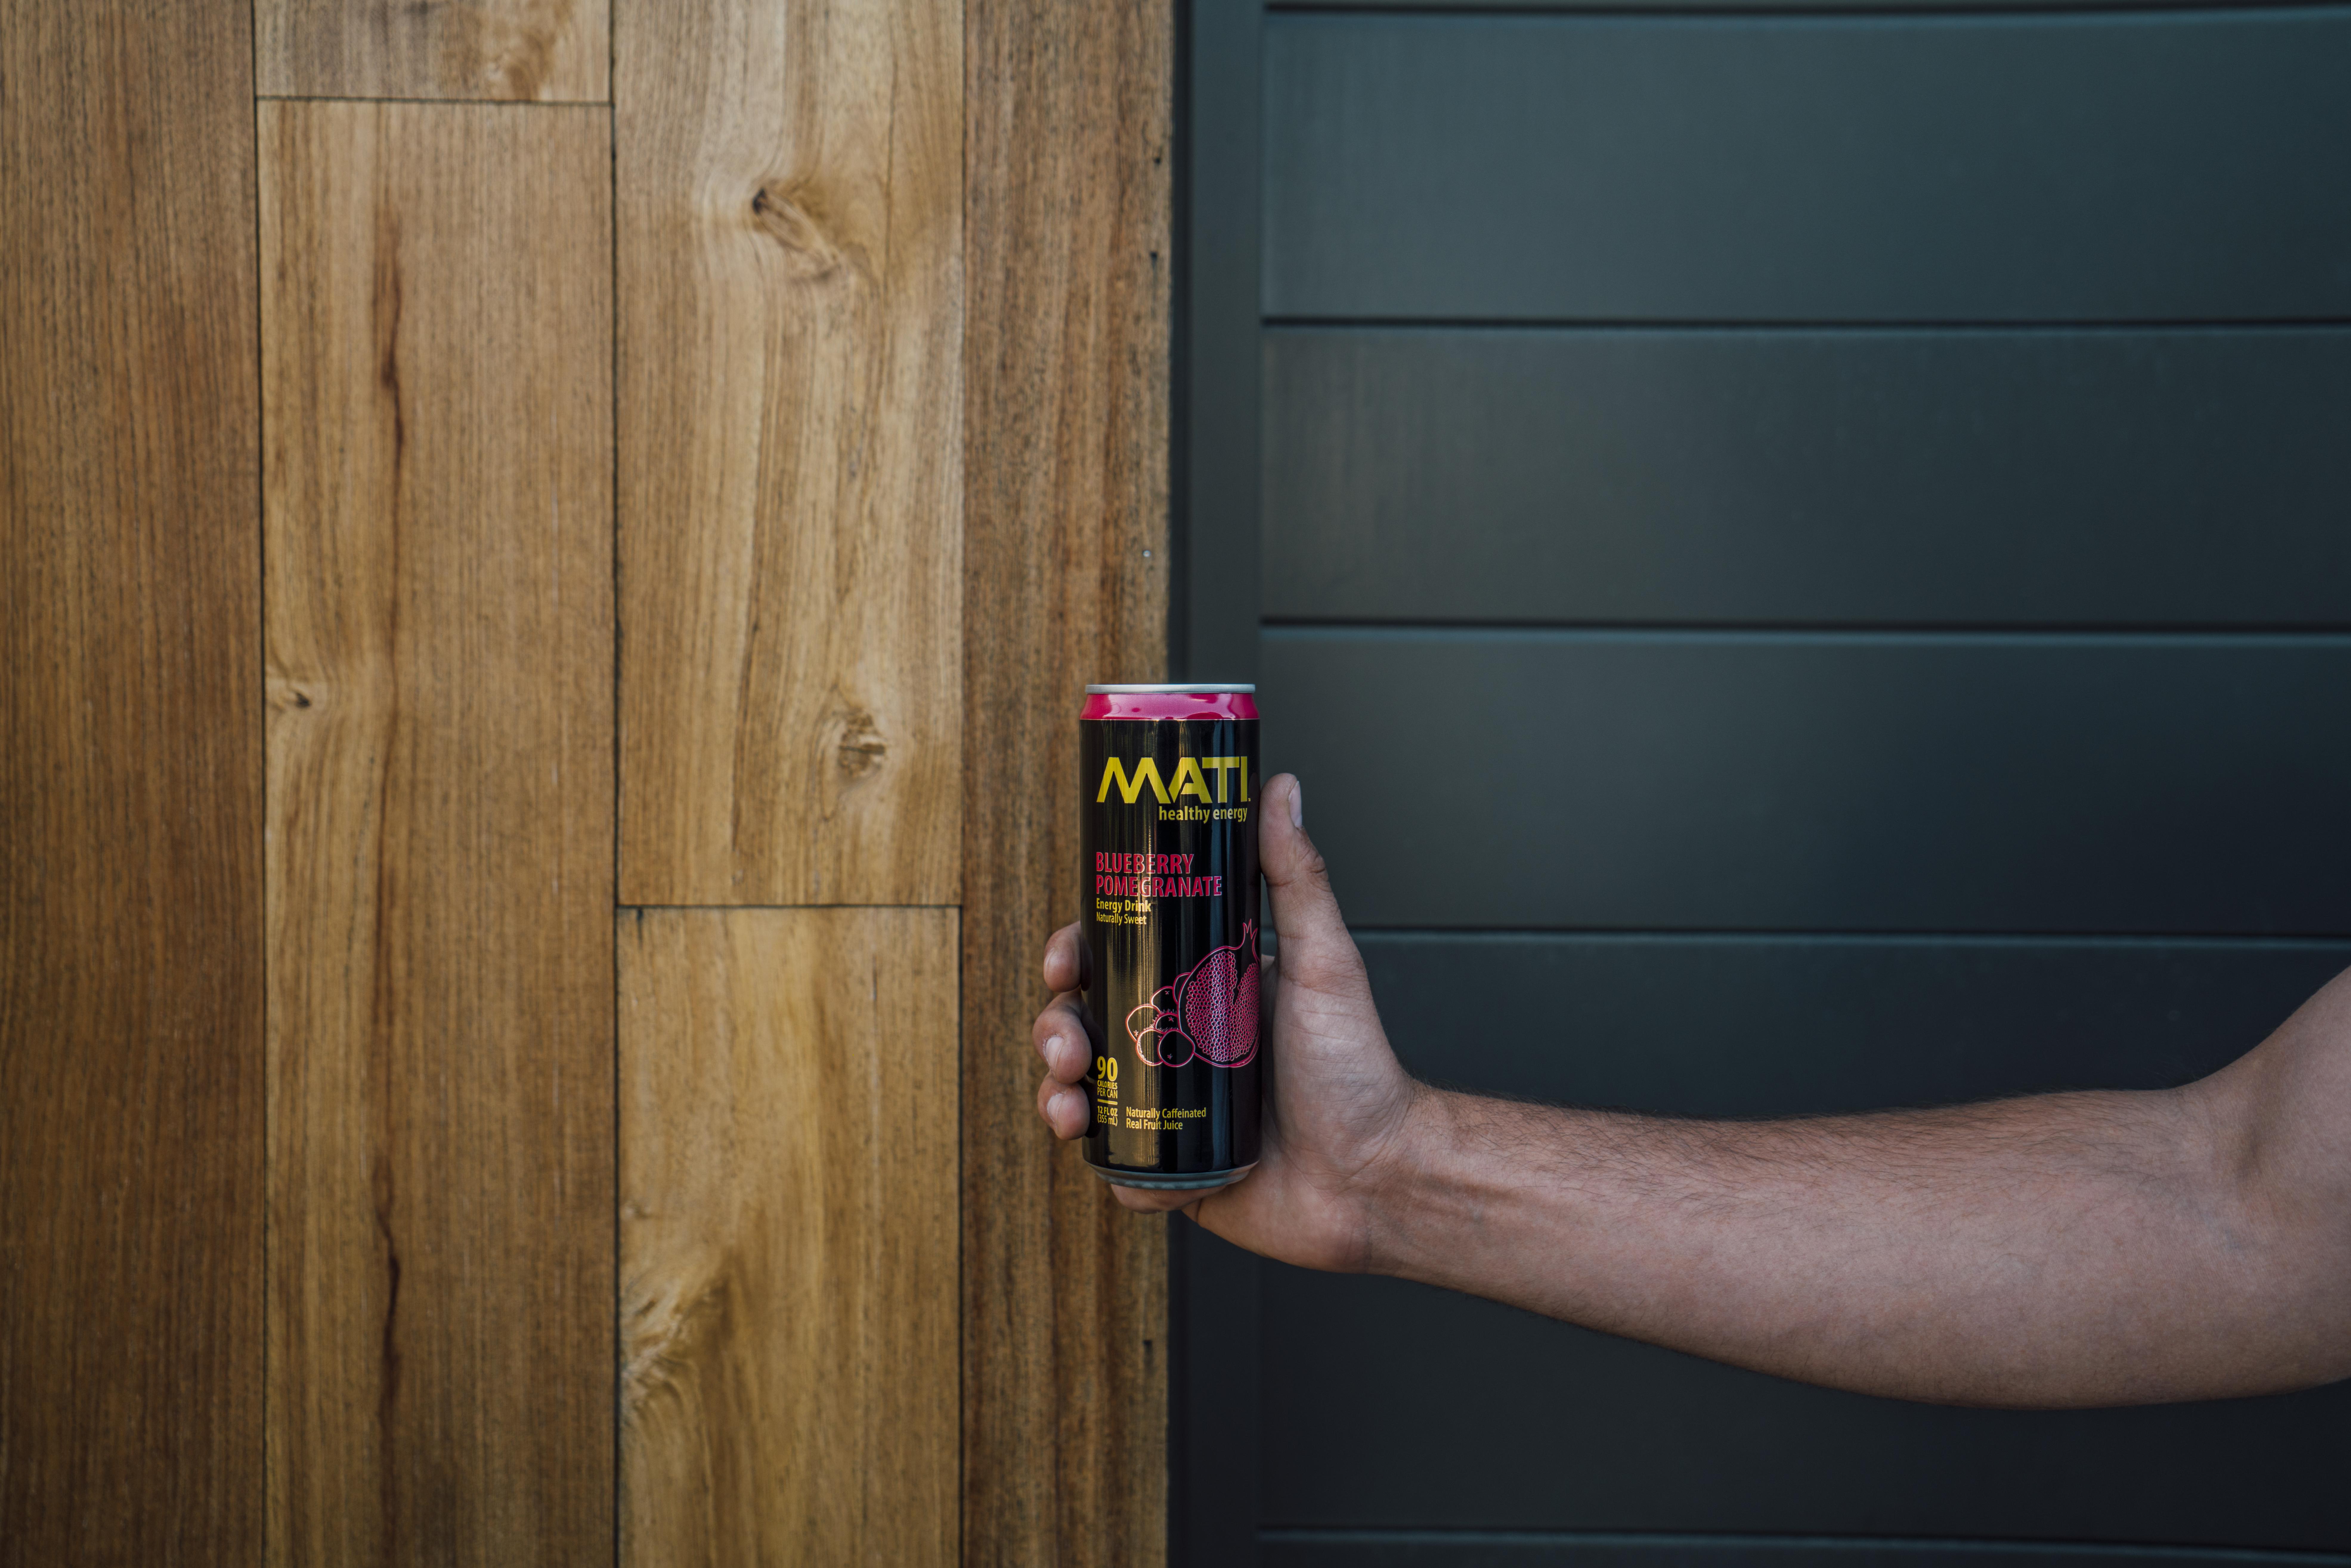 BLUEBERRY POMEGRANATE 12 Pack – MATI Energy